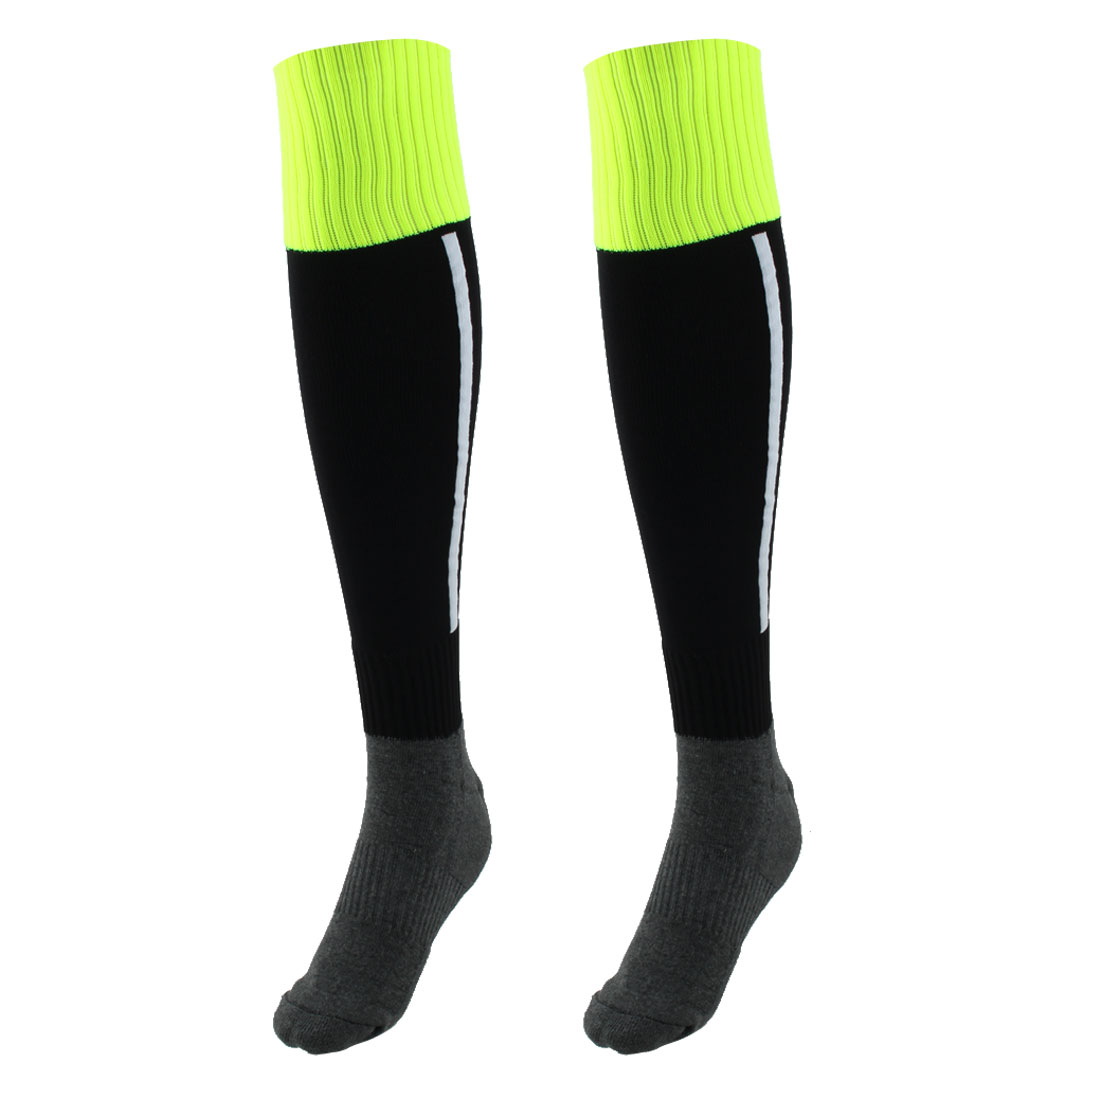 Men Sport Nylon Knee High Elastic Cuffs Baseball Football Soccer Long Socks Black Pair